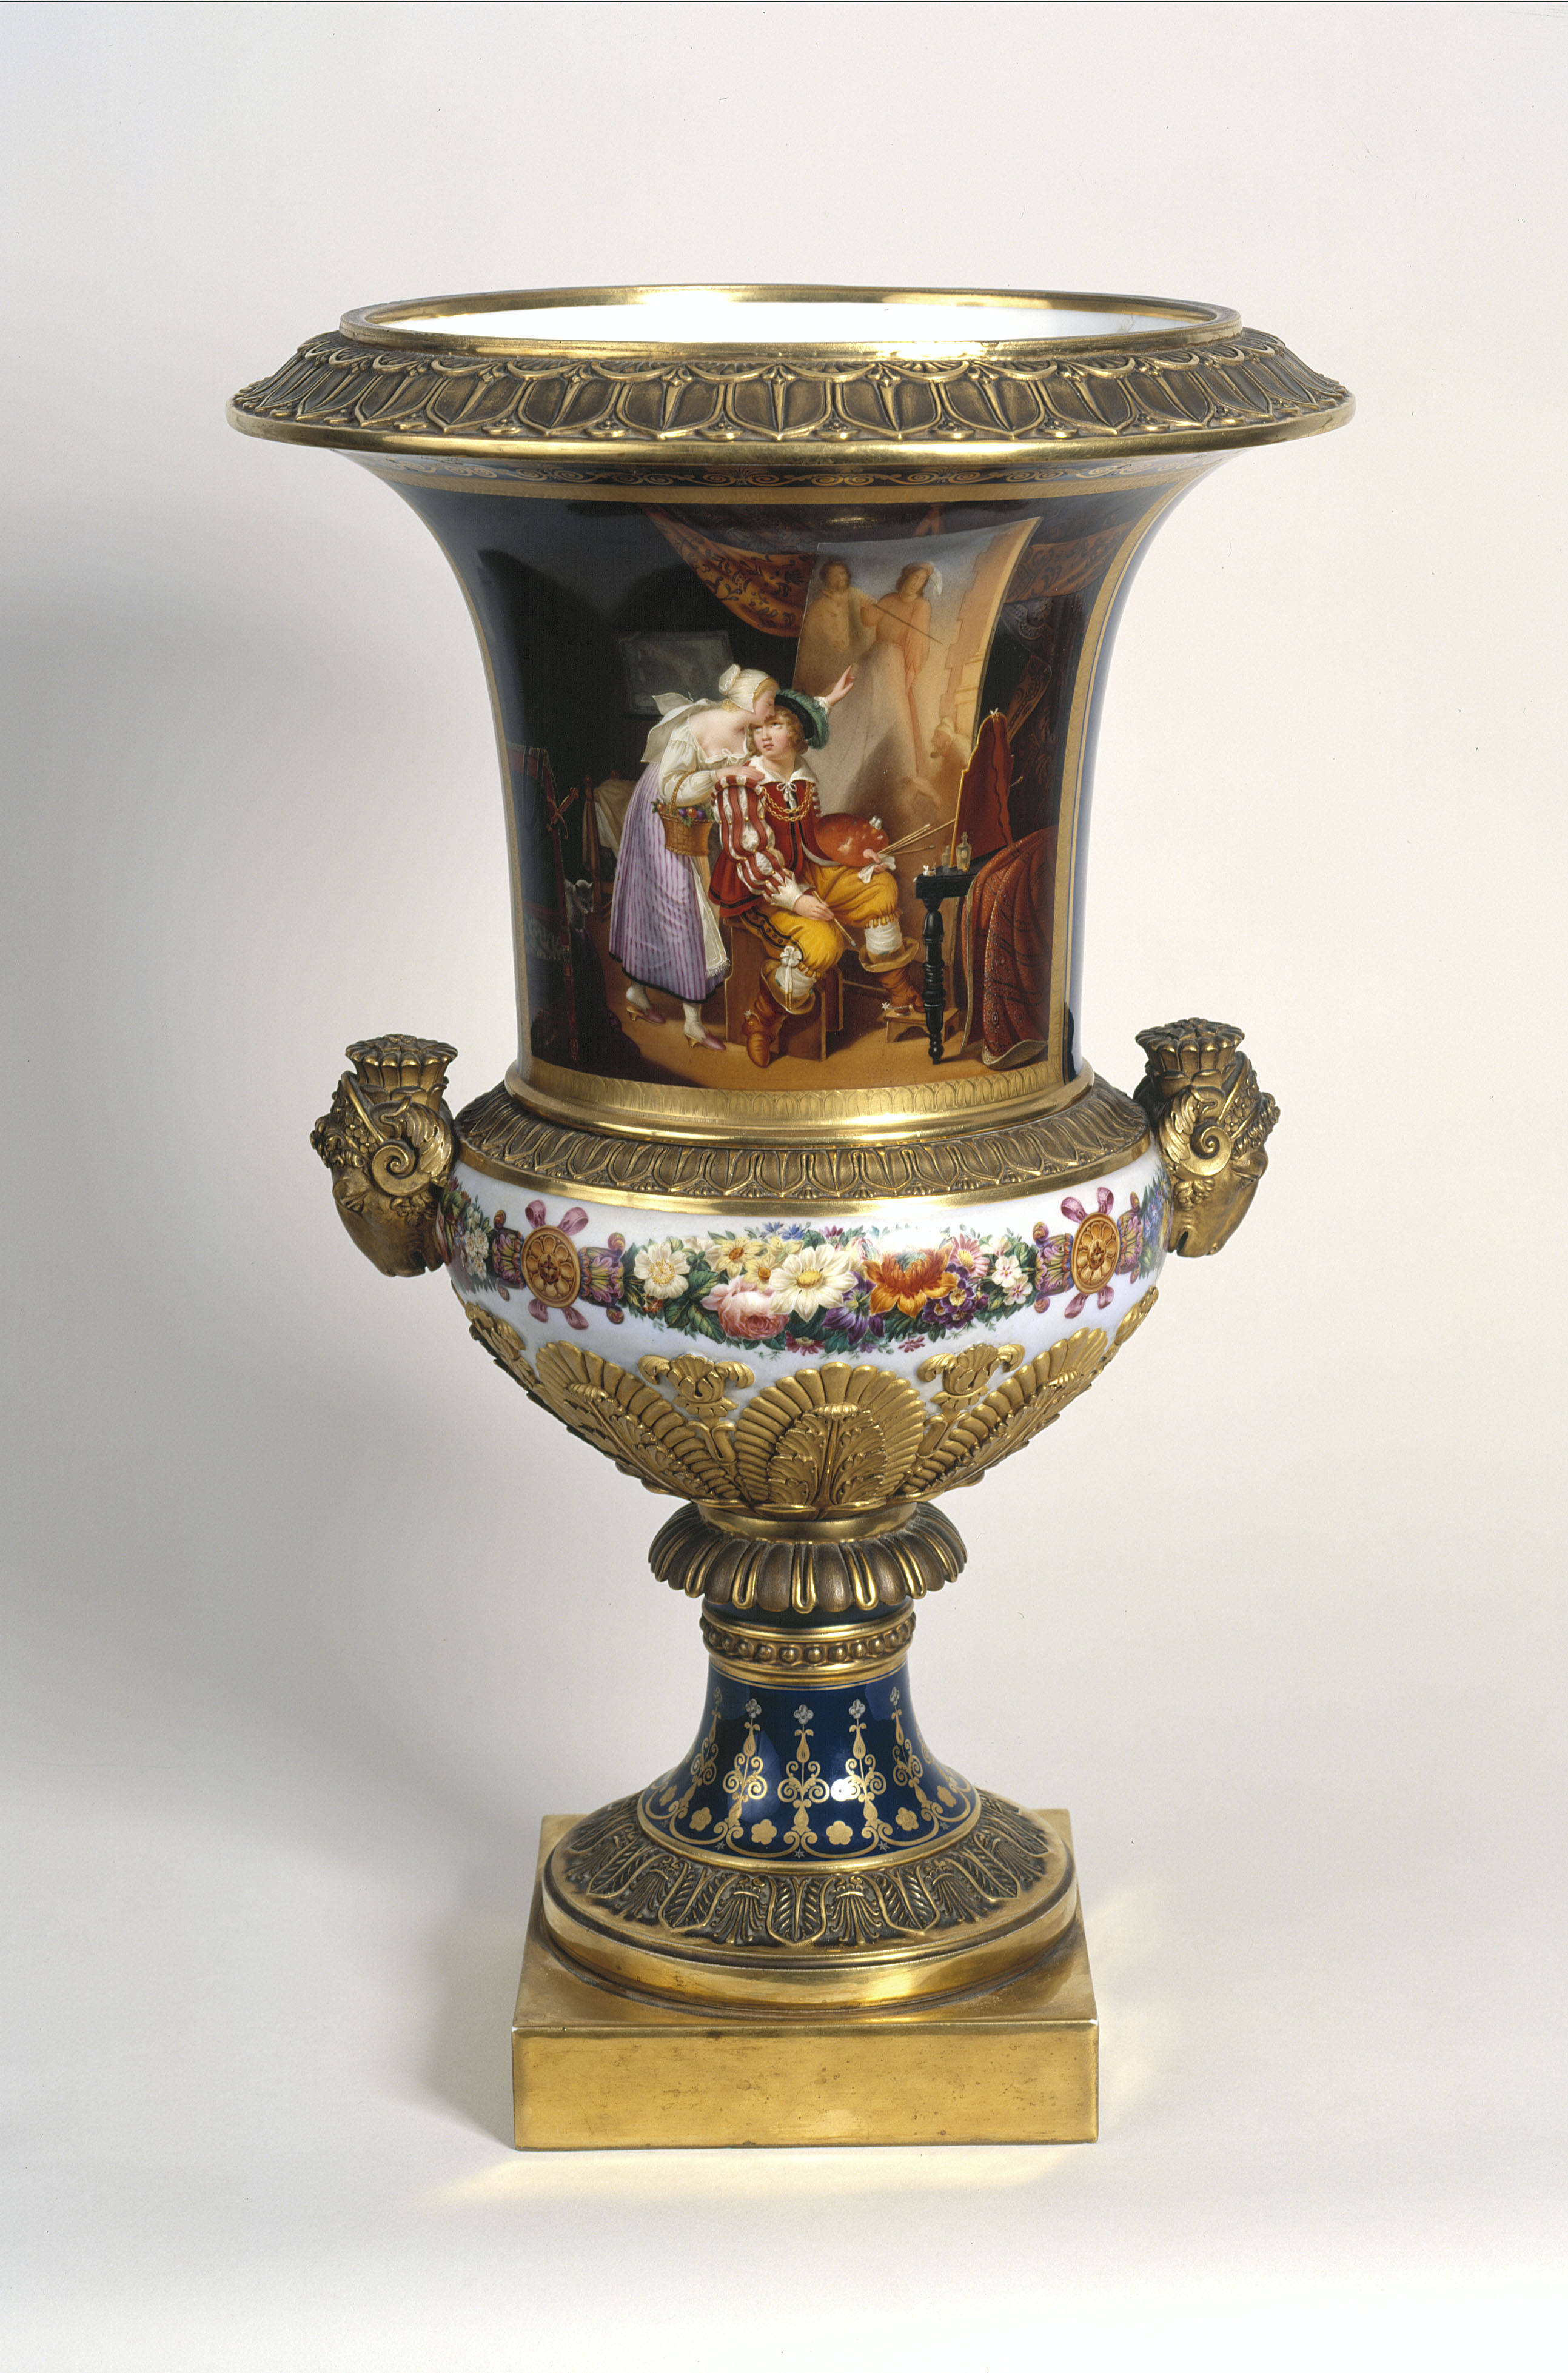 Louis-Ferdinand Lachassaigne - Vase